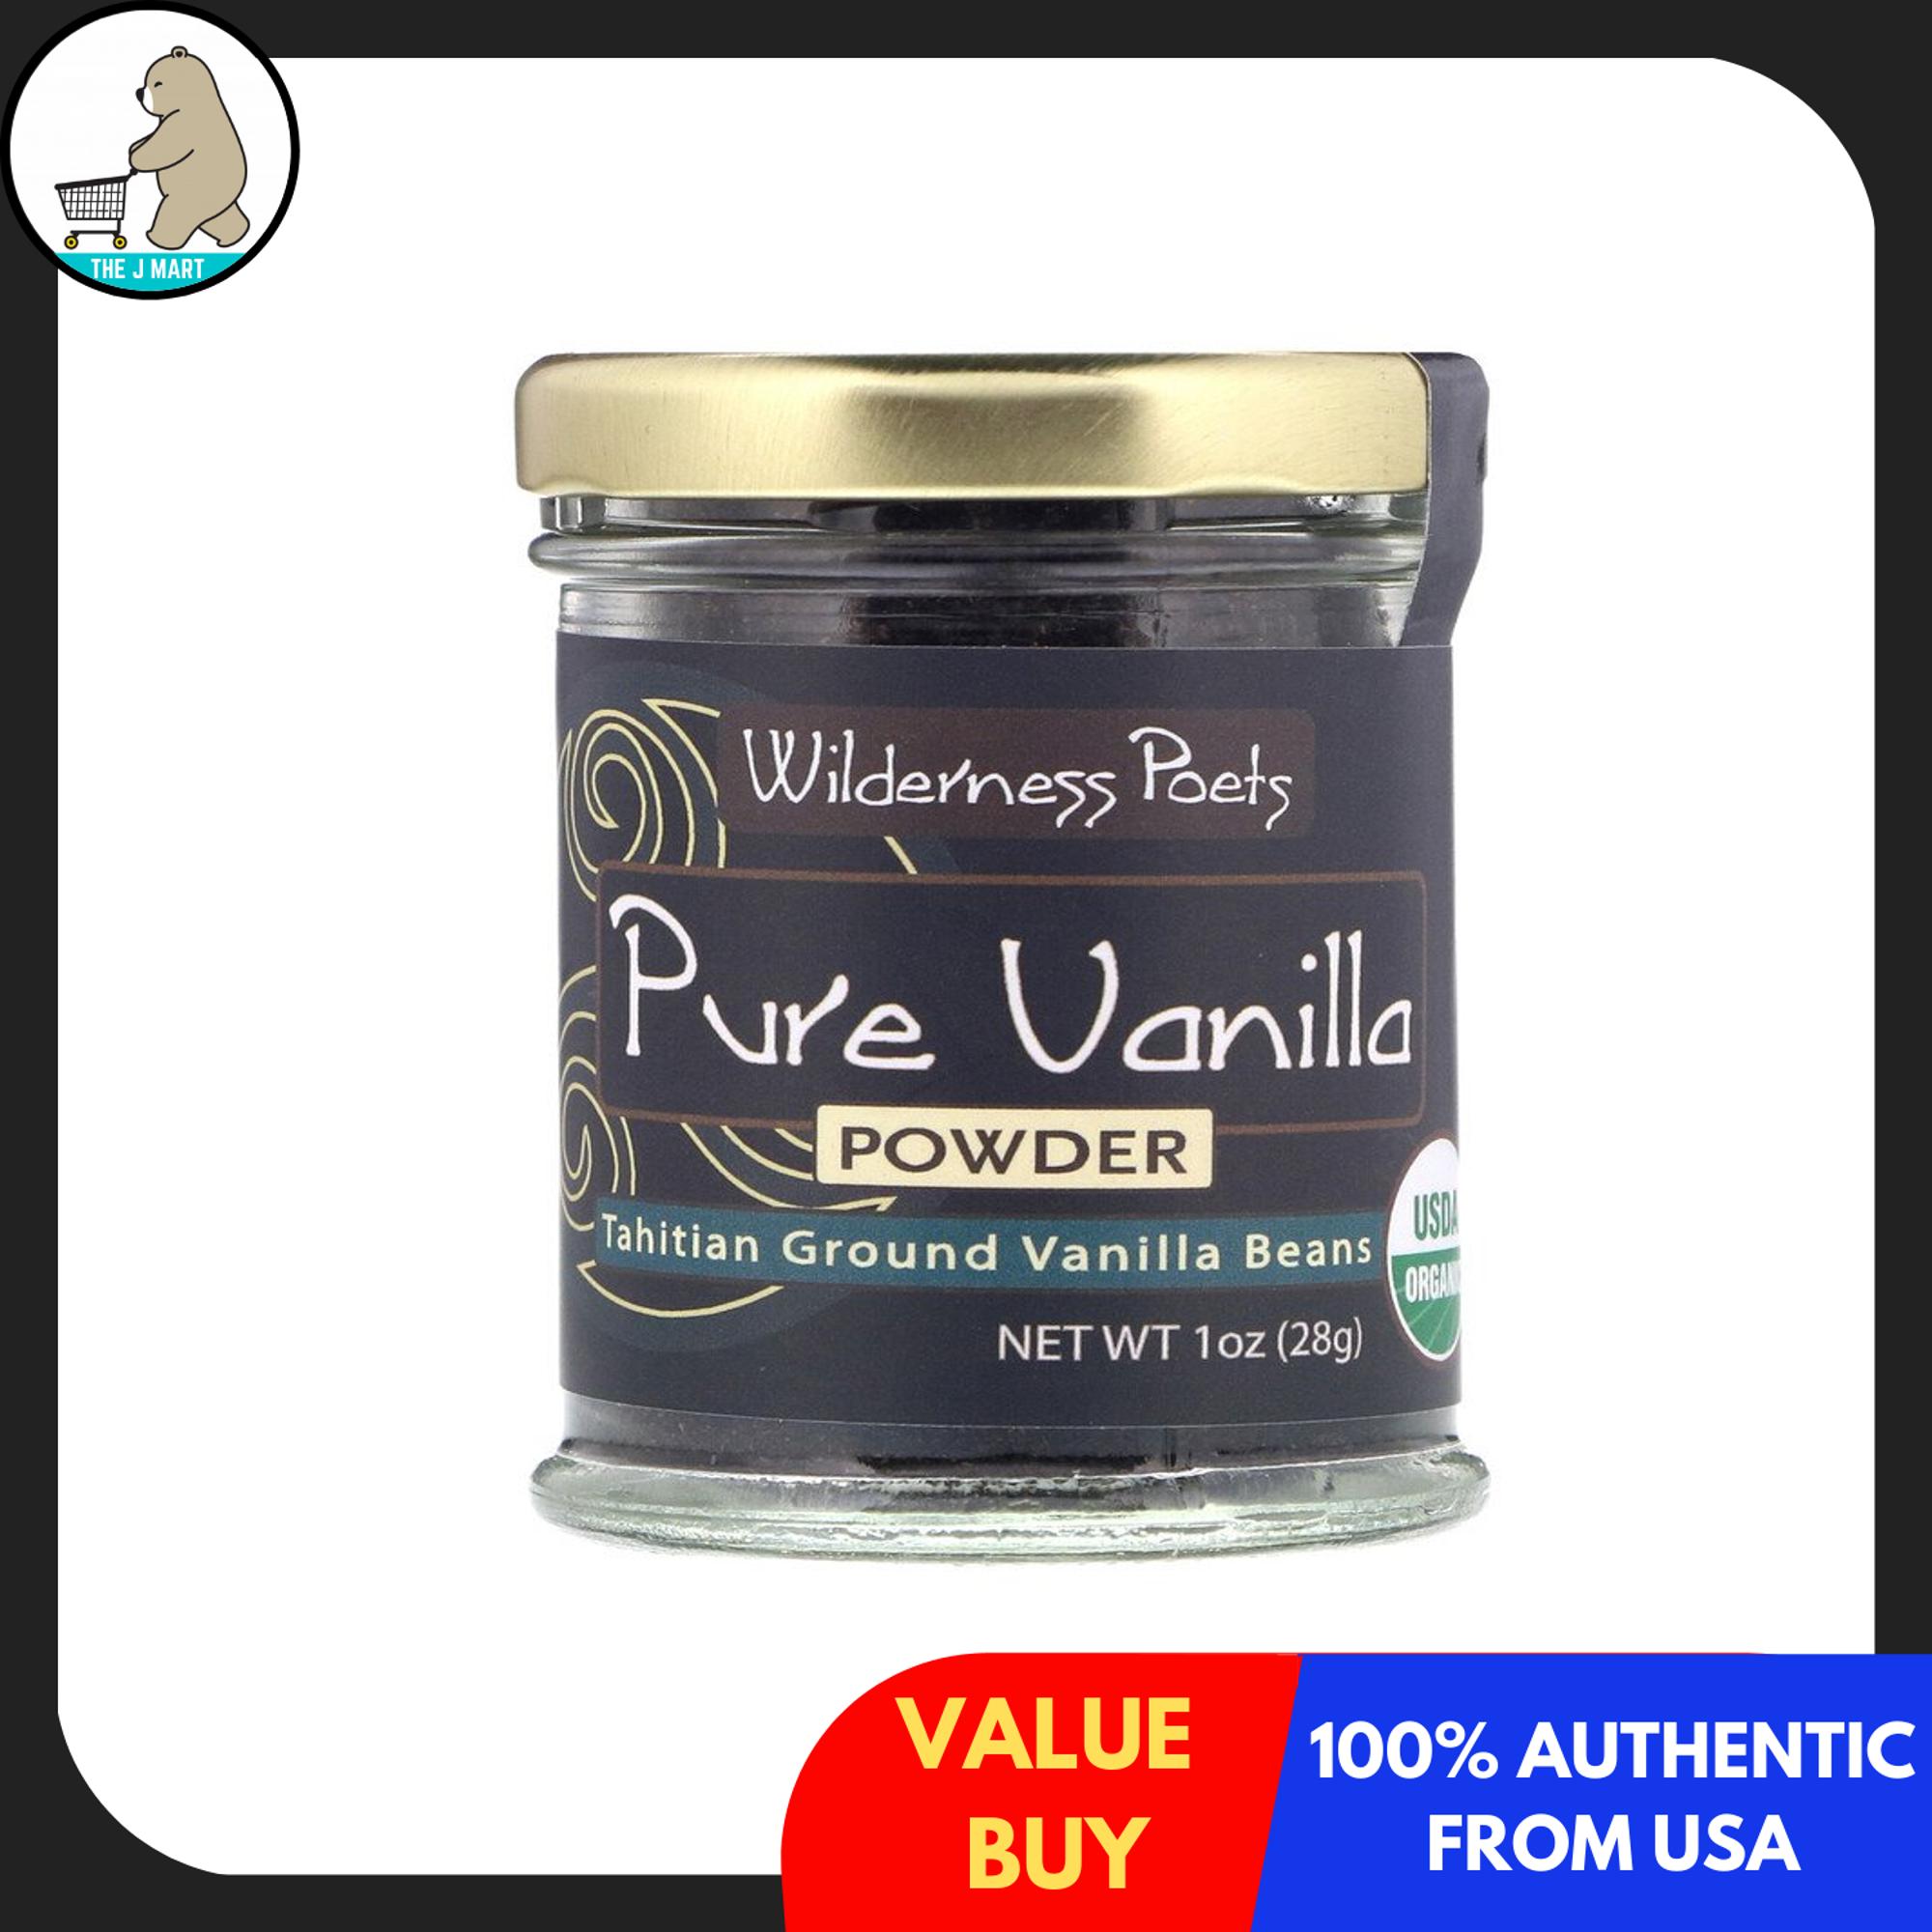 Wilderness Poets, Pure Vanilla Powder, Tahitian Ground Vanilla ...